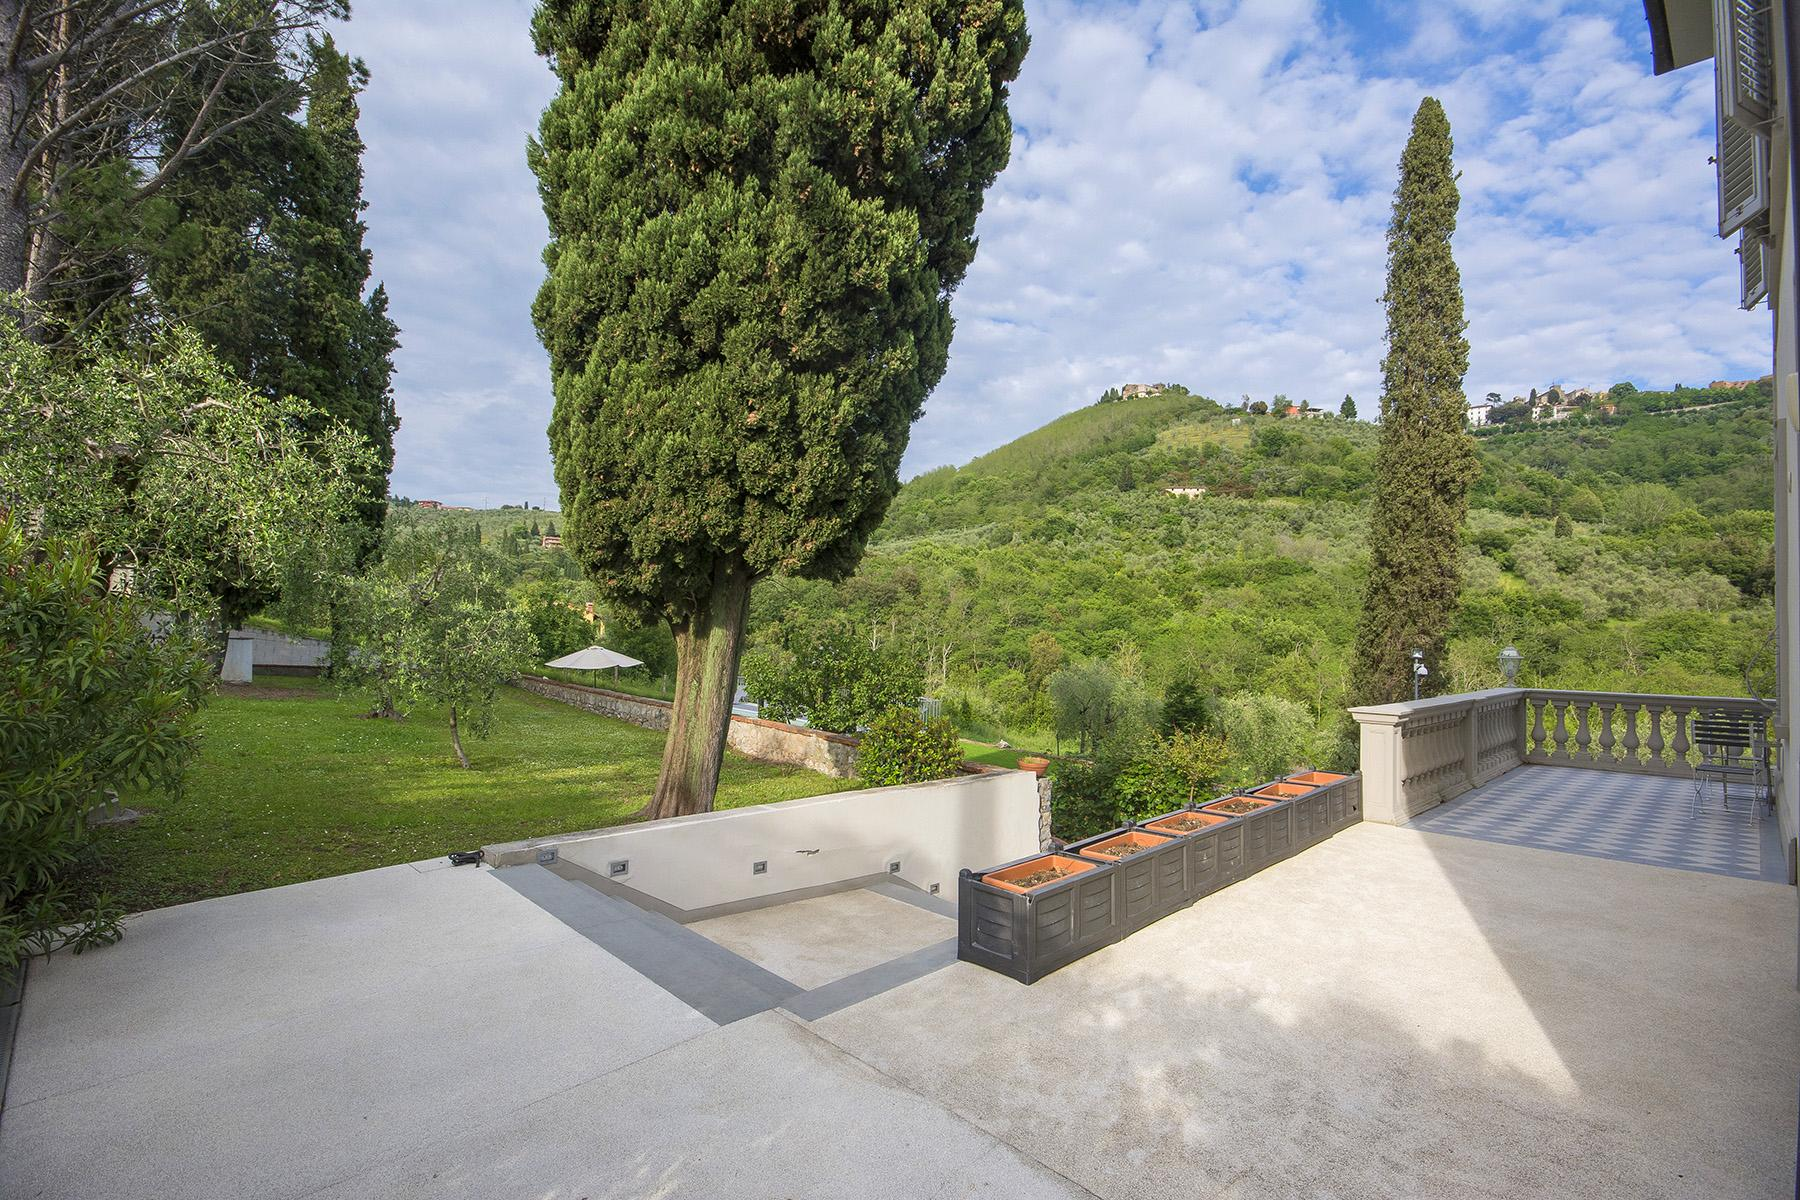 Montecatini Terme小镇优雅的新艺术风格的别墅 - 35